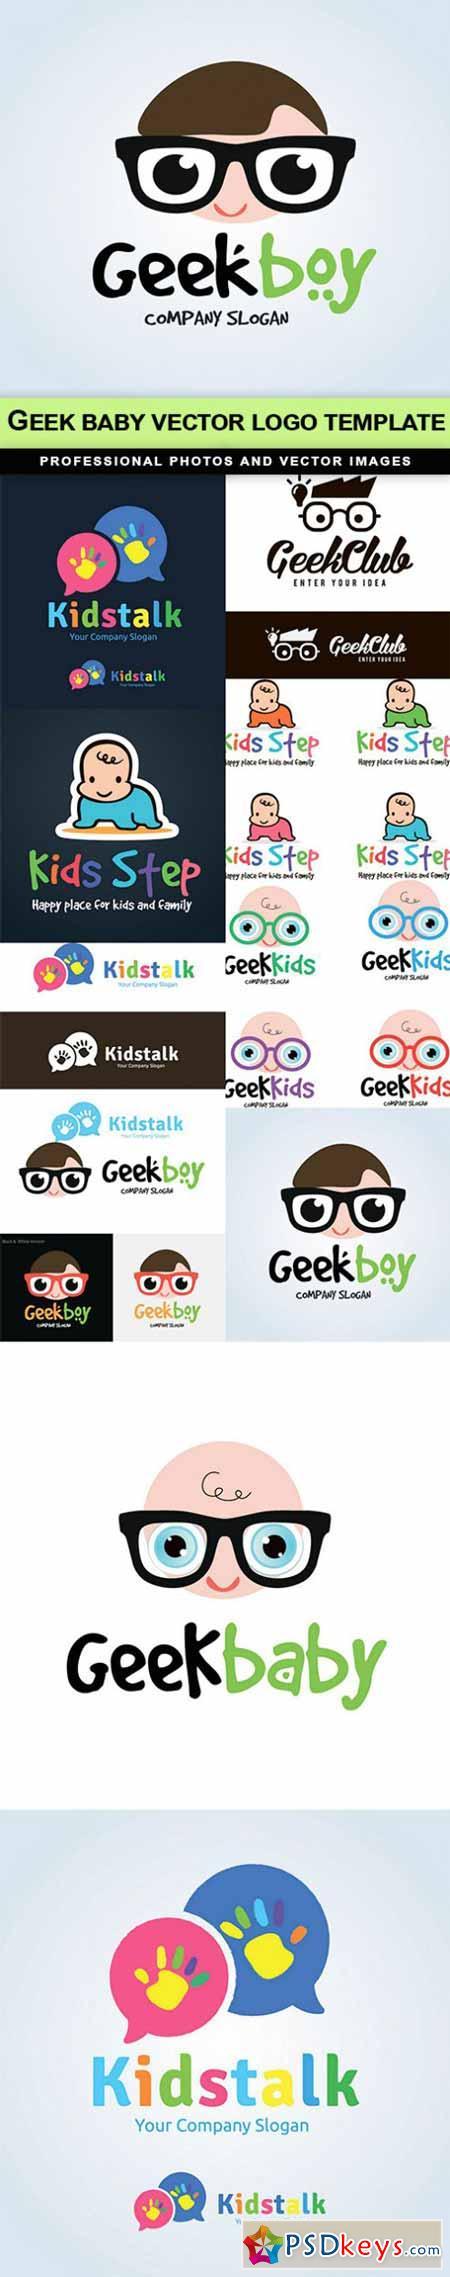 Geek baby vector logo template - 10 EPS